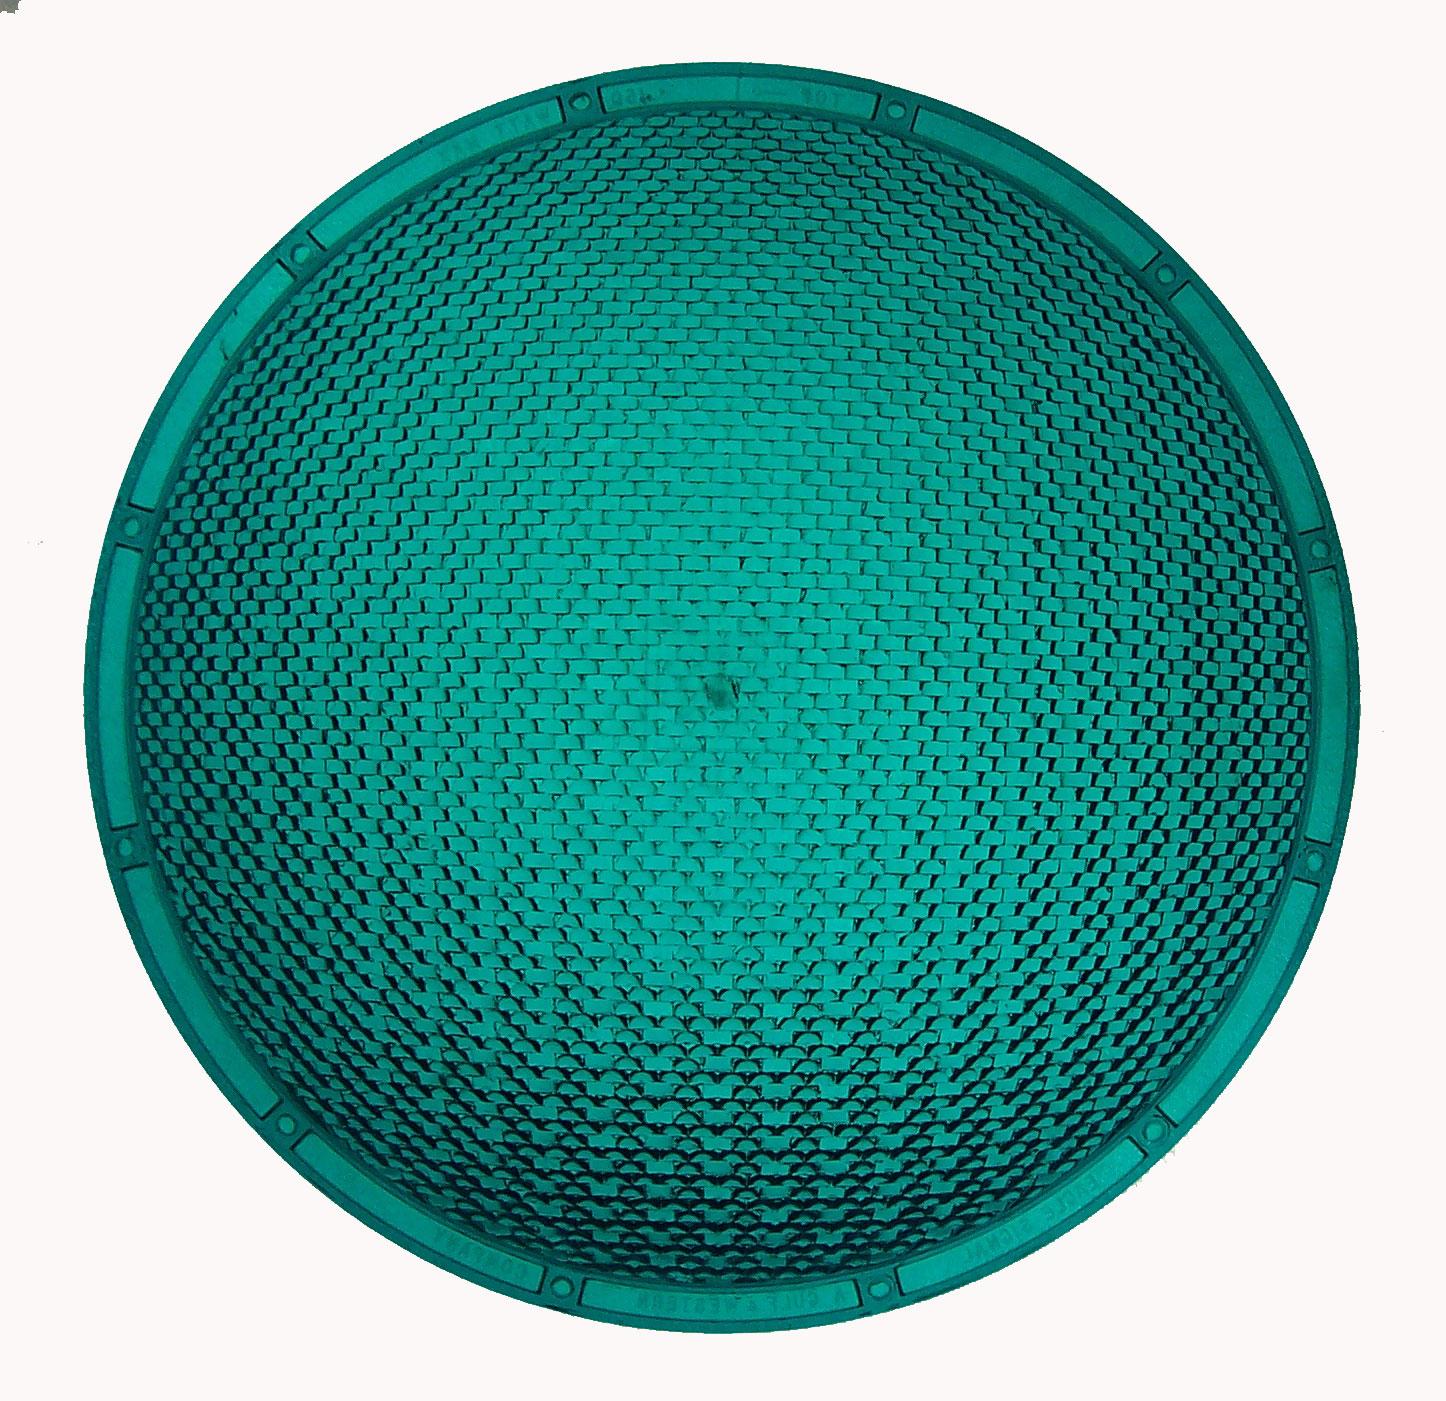 clipart traffic light green - photo #37